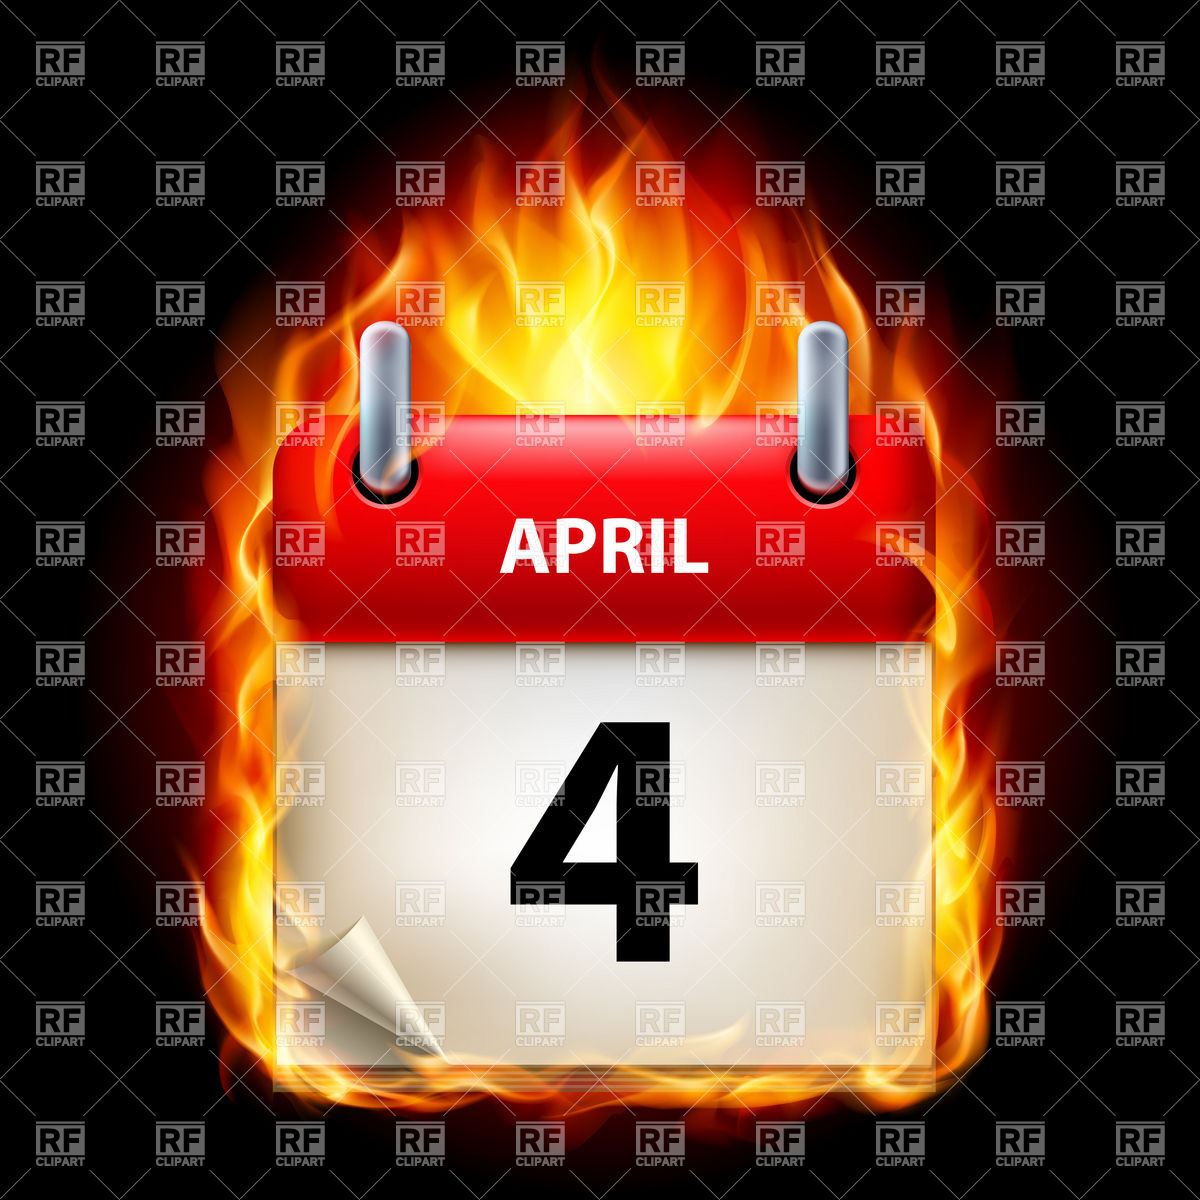 Calendar clipart april 4th. Th clipartfest burning icon